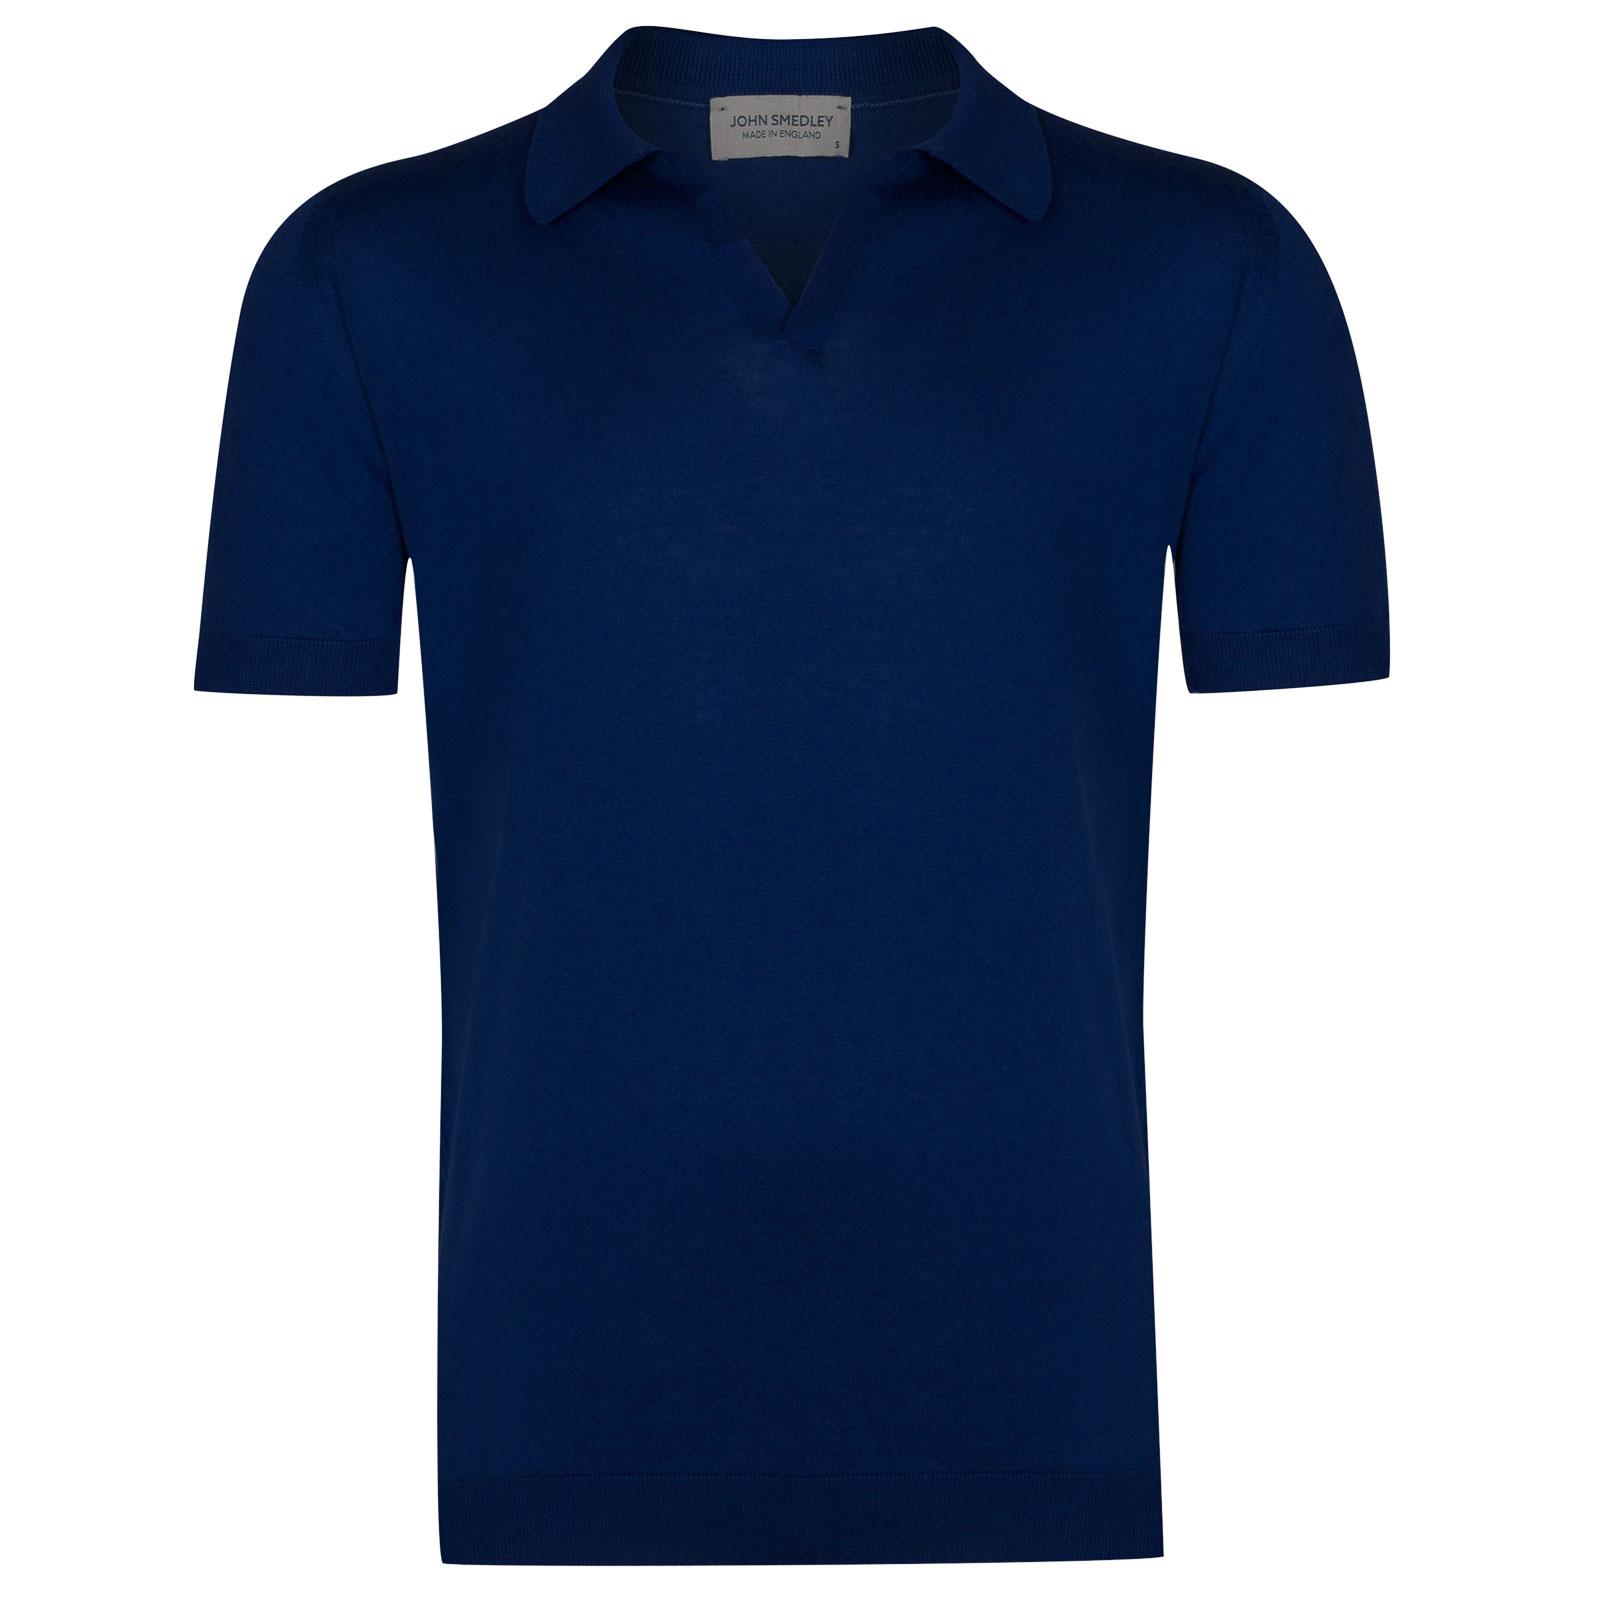 noah-stevens-blue-S